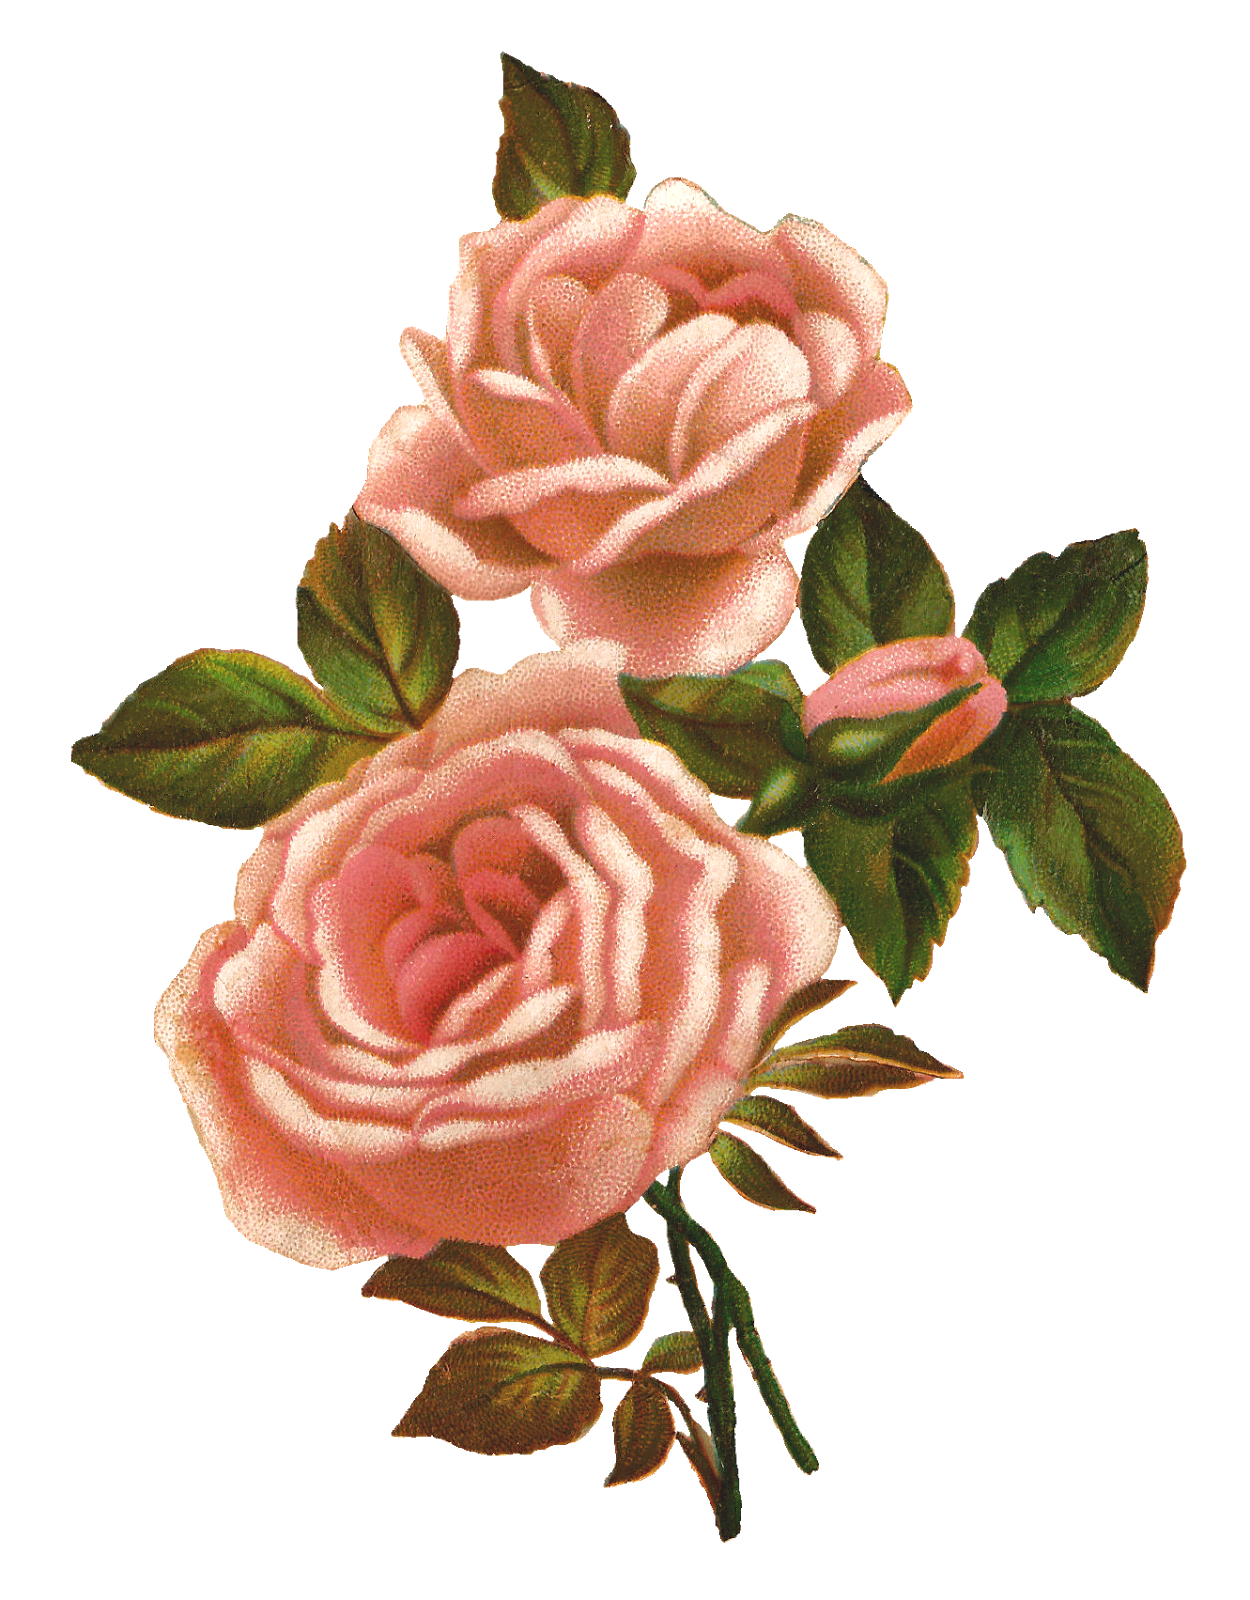 Antique Images: Pink Rose Stock Image Vintage Shabby ...